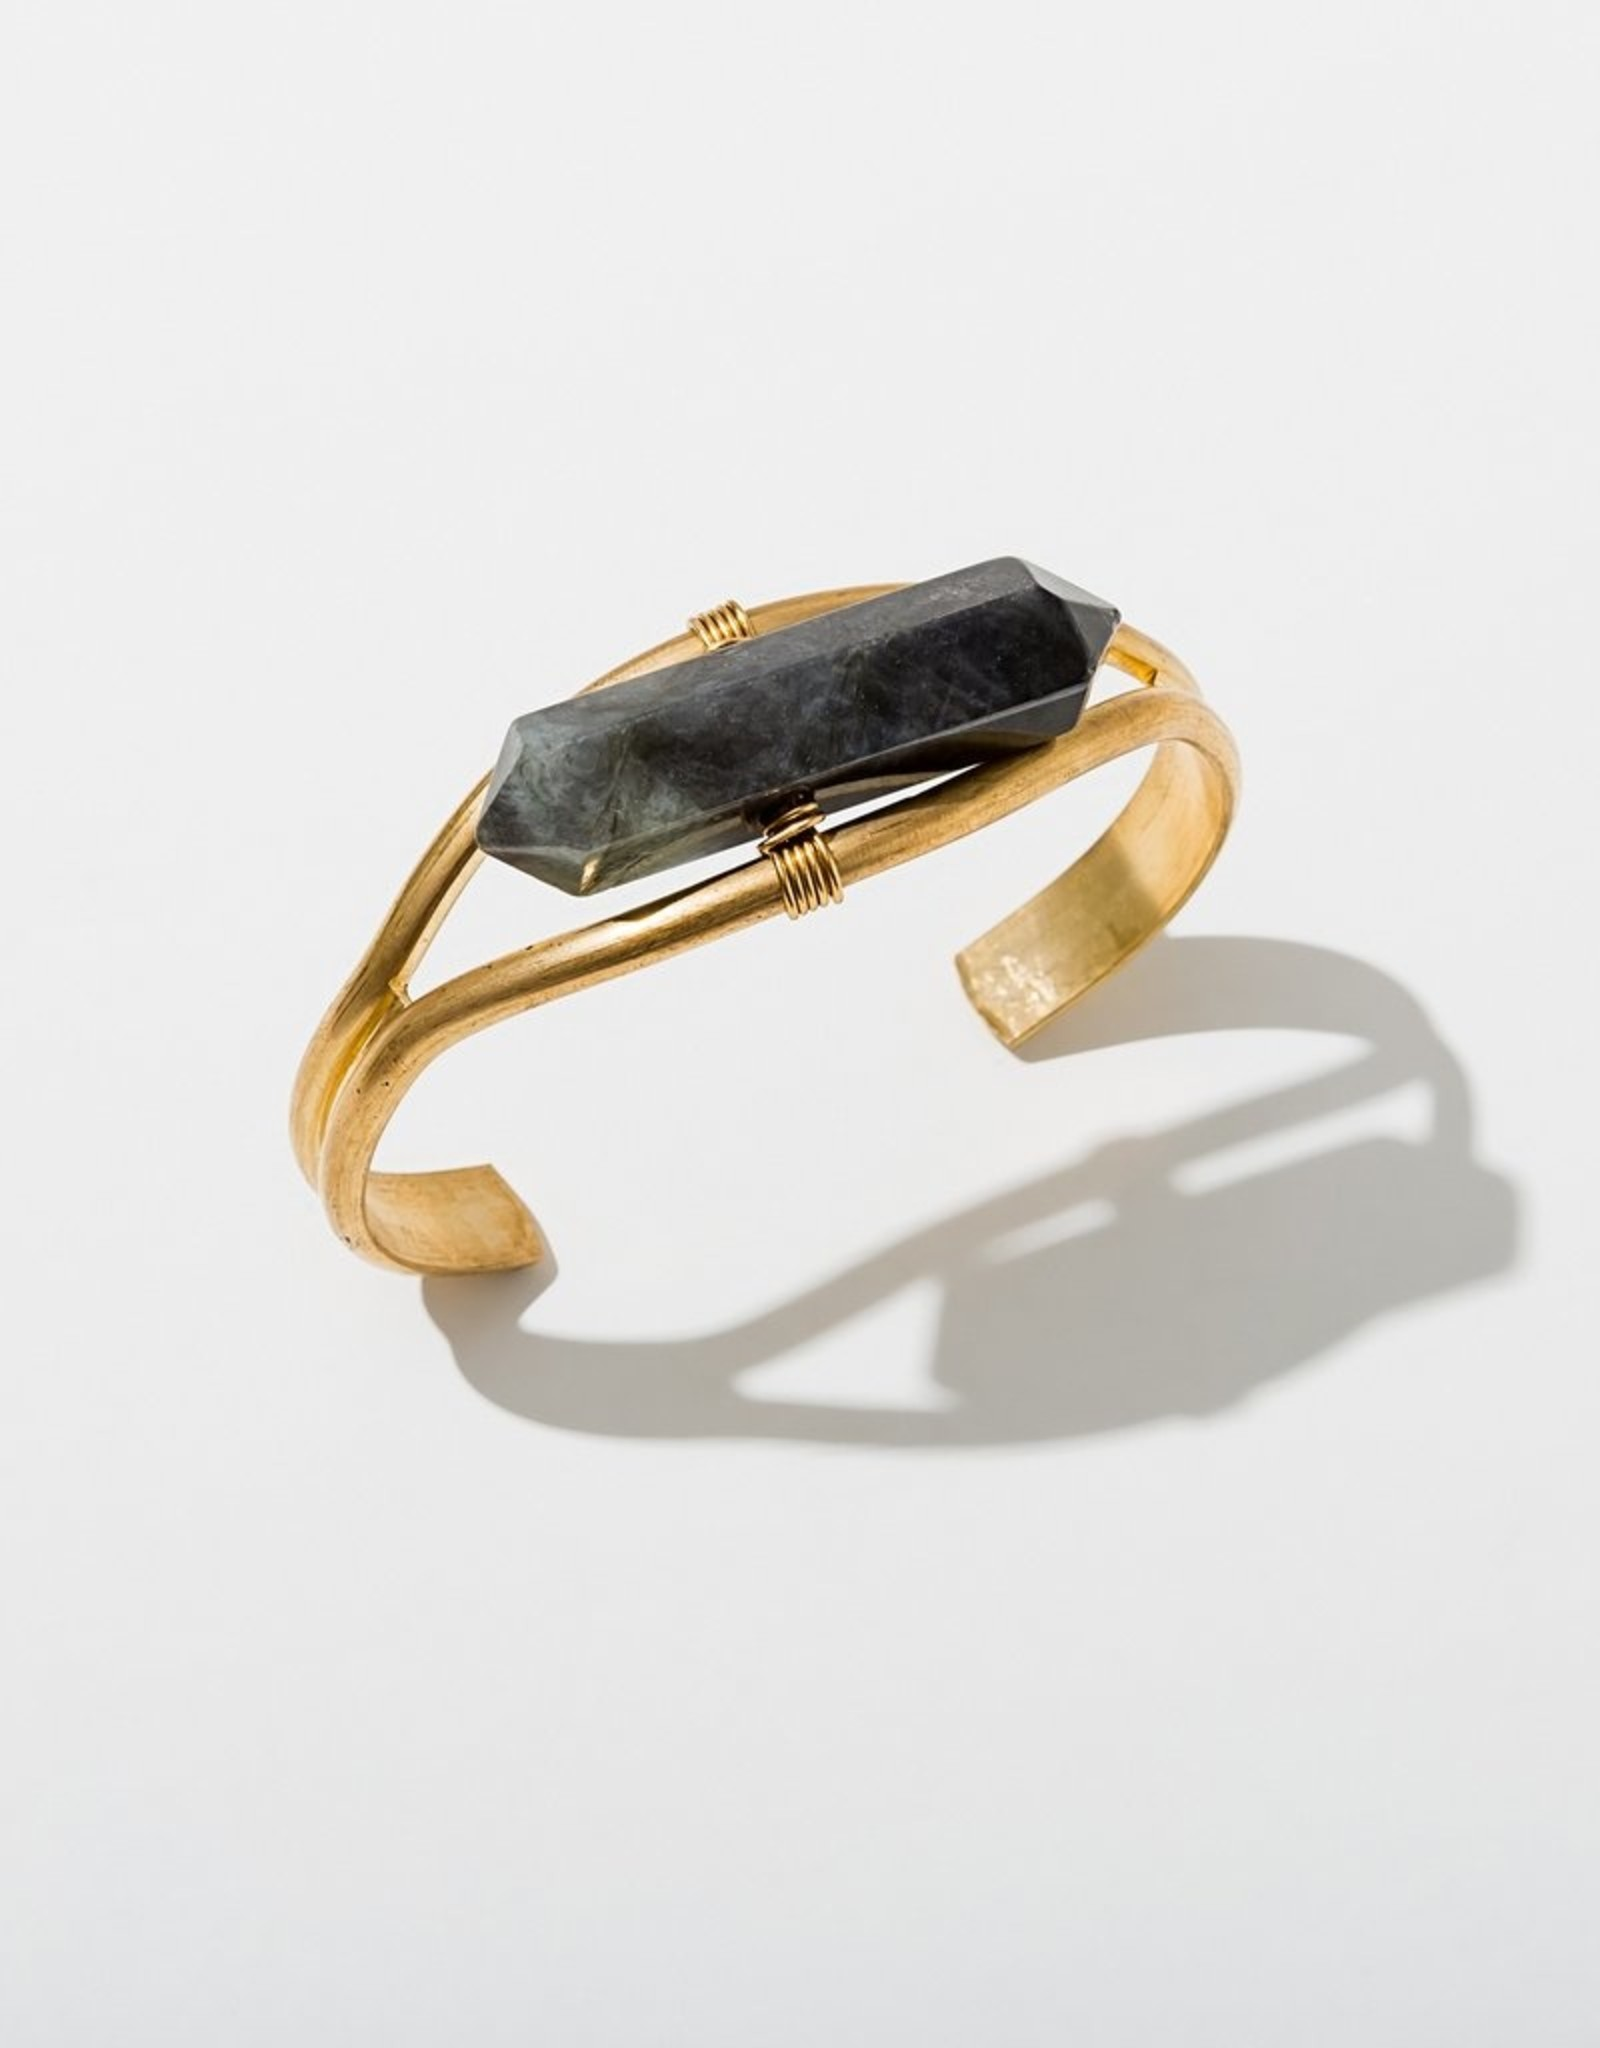 Larissa Loden Jewelry Crystal Cuff Bracelets by Larissa Loden